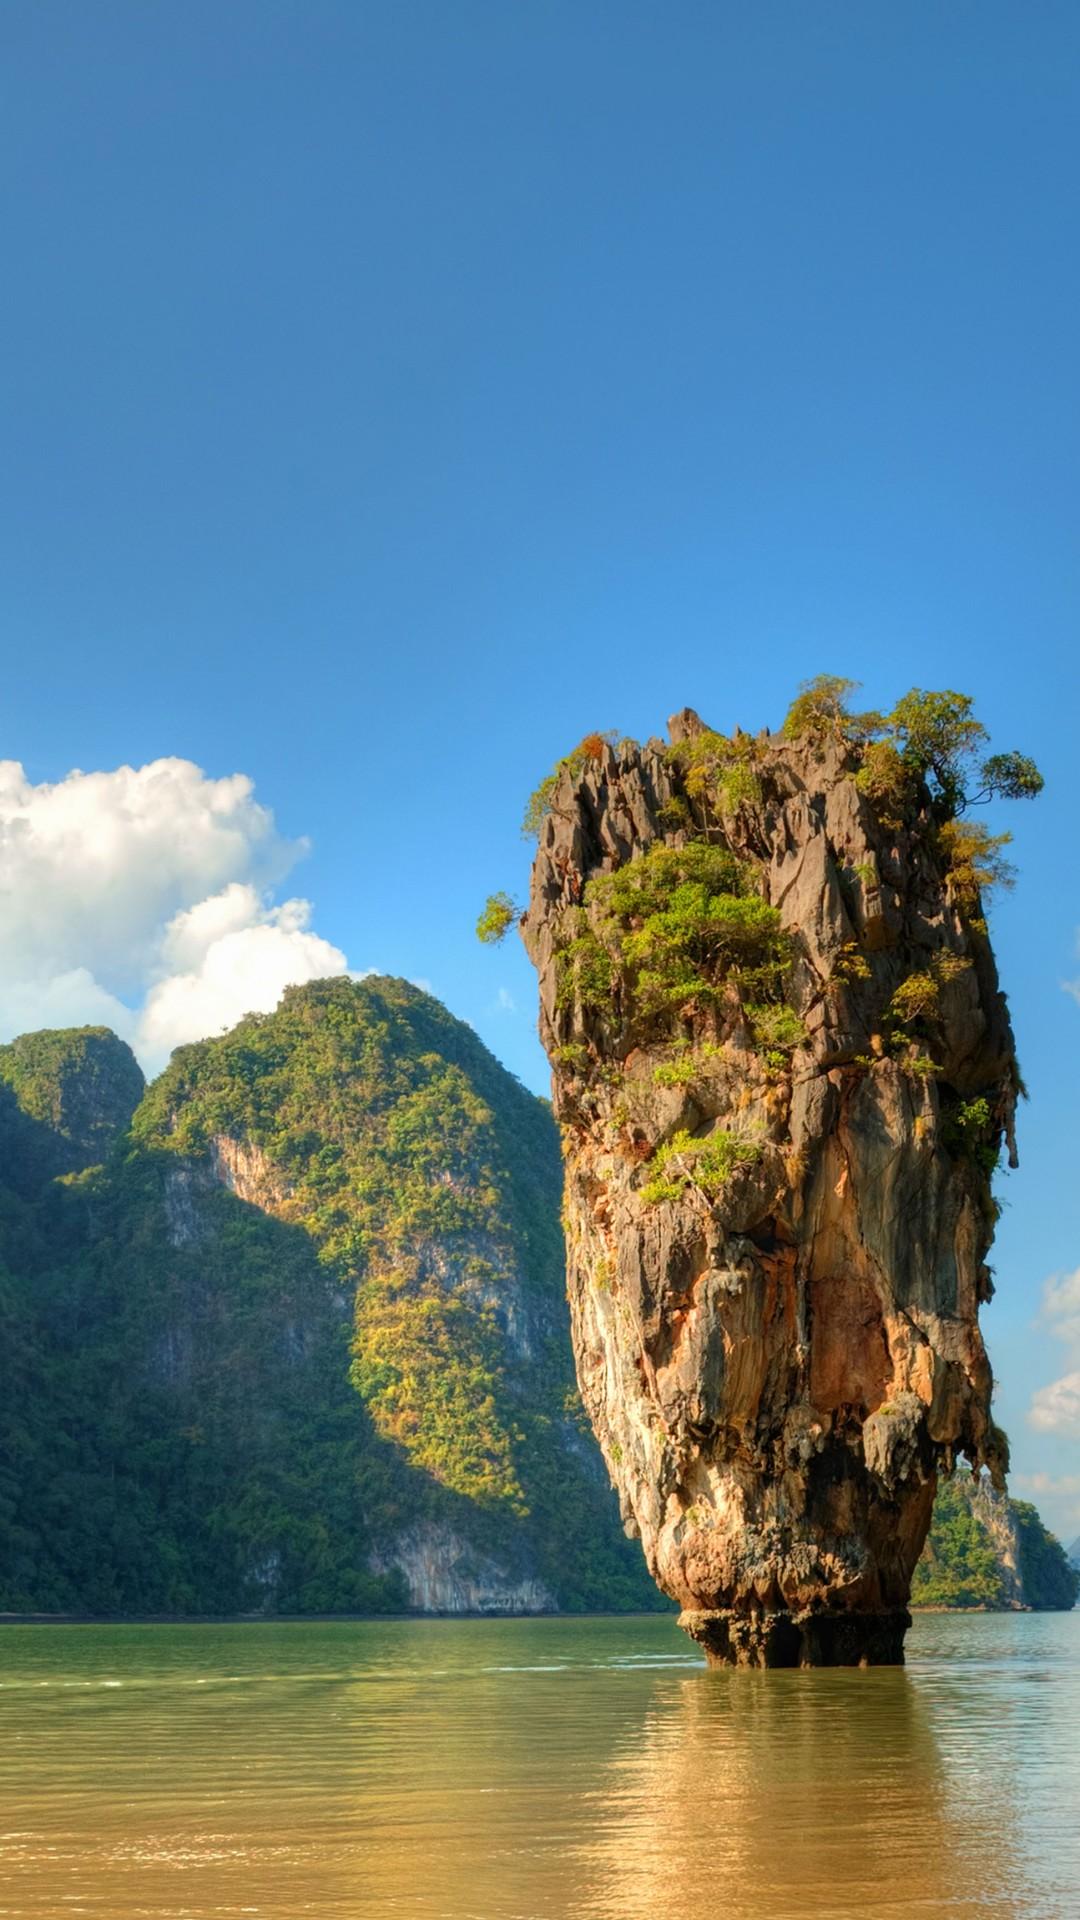 Best Mountain Bikes >> Wallpaper Ko Tapu, Thailand, islands, mountains, rocks, ocean, 5k, Travel #16556